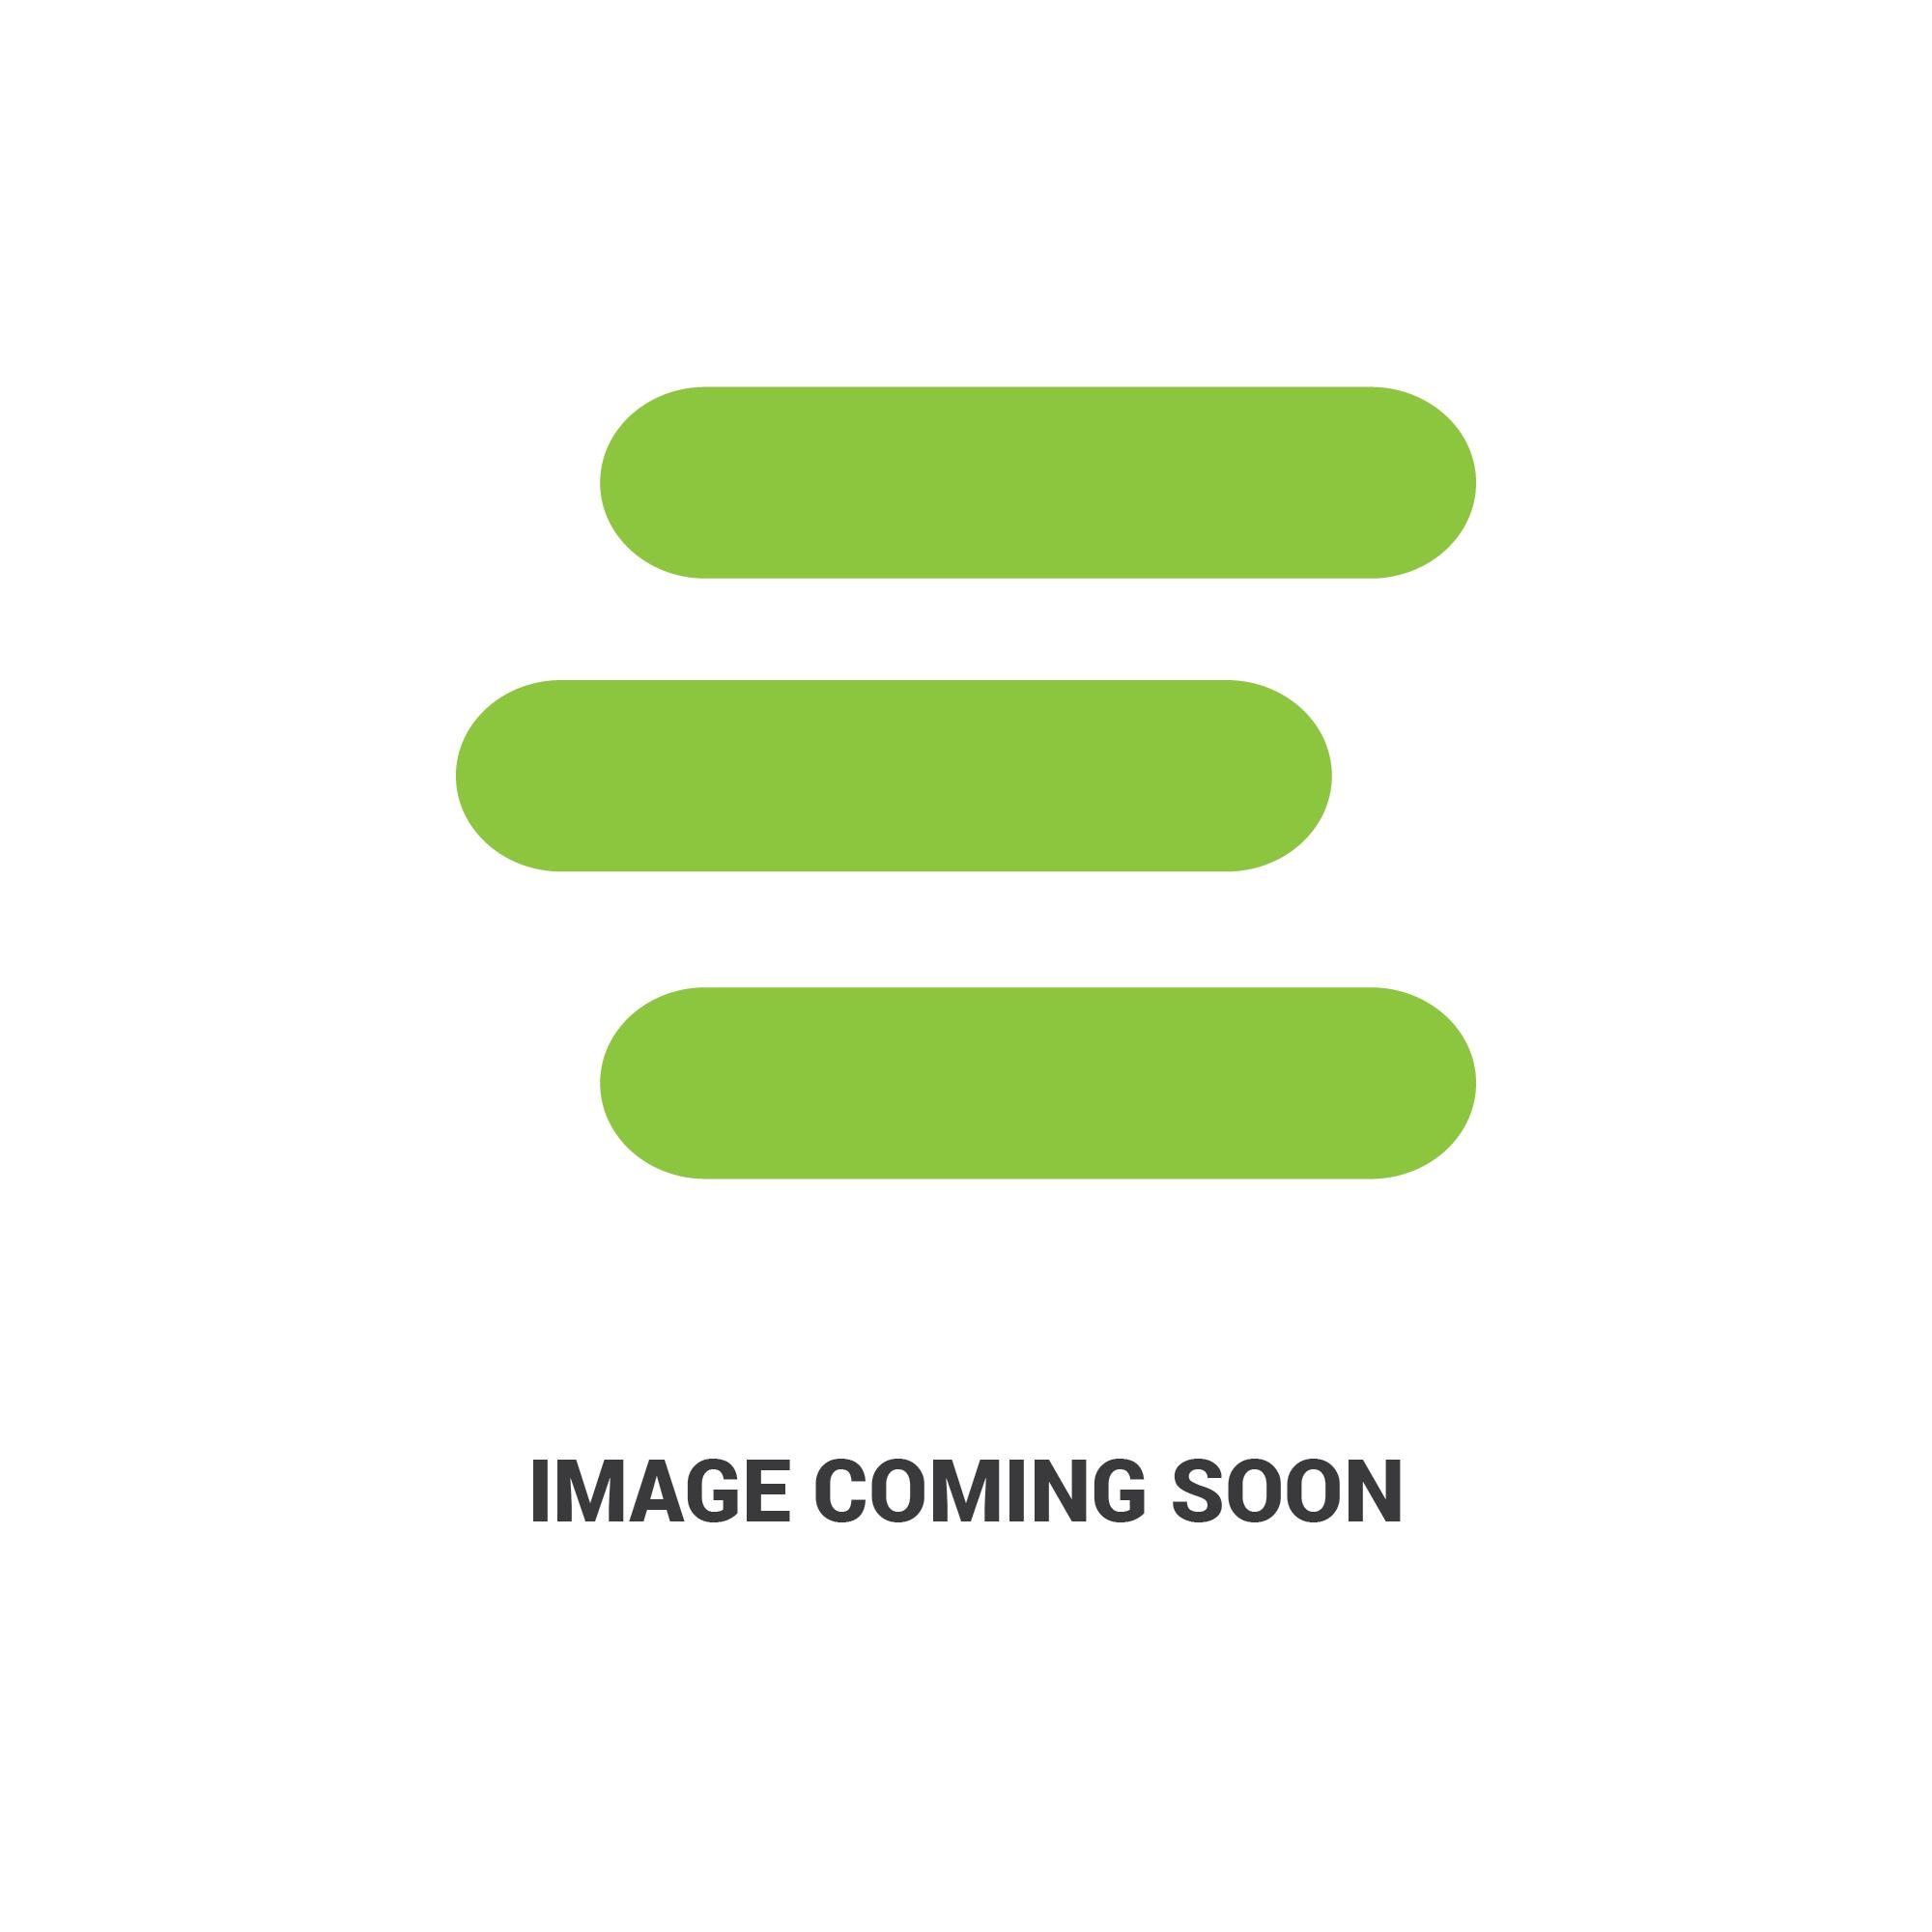 E-LP012edit 1.jpg